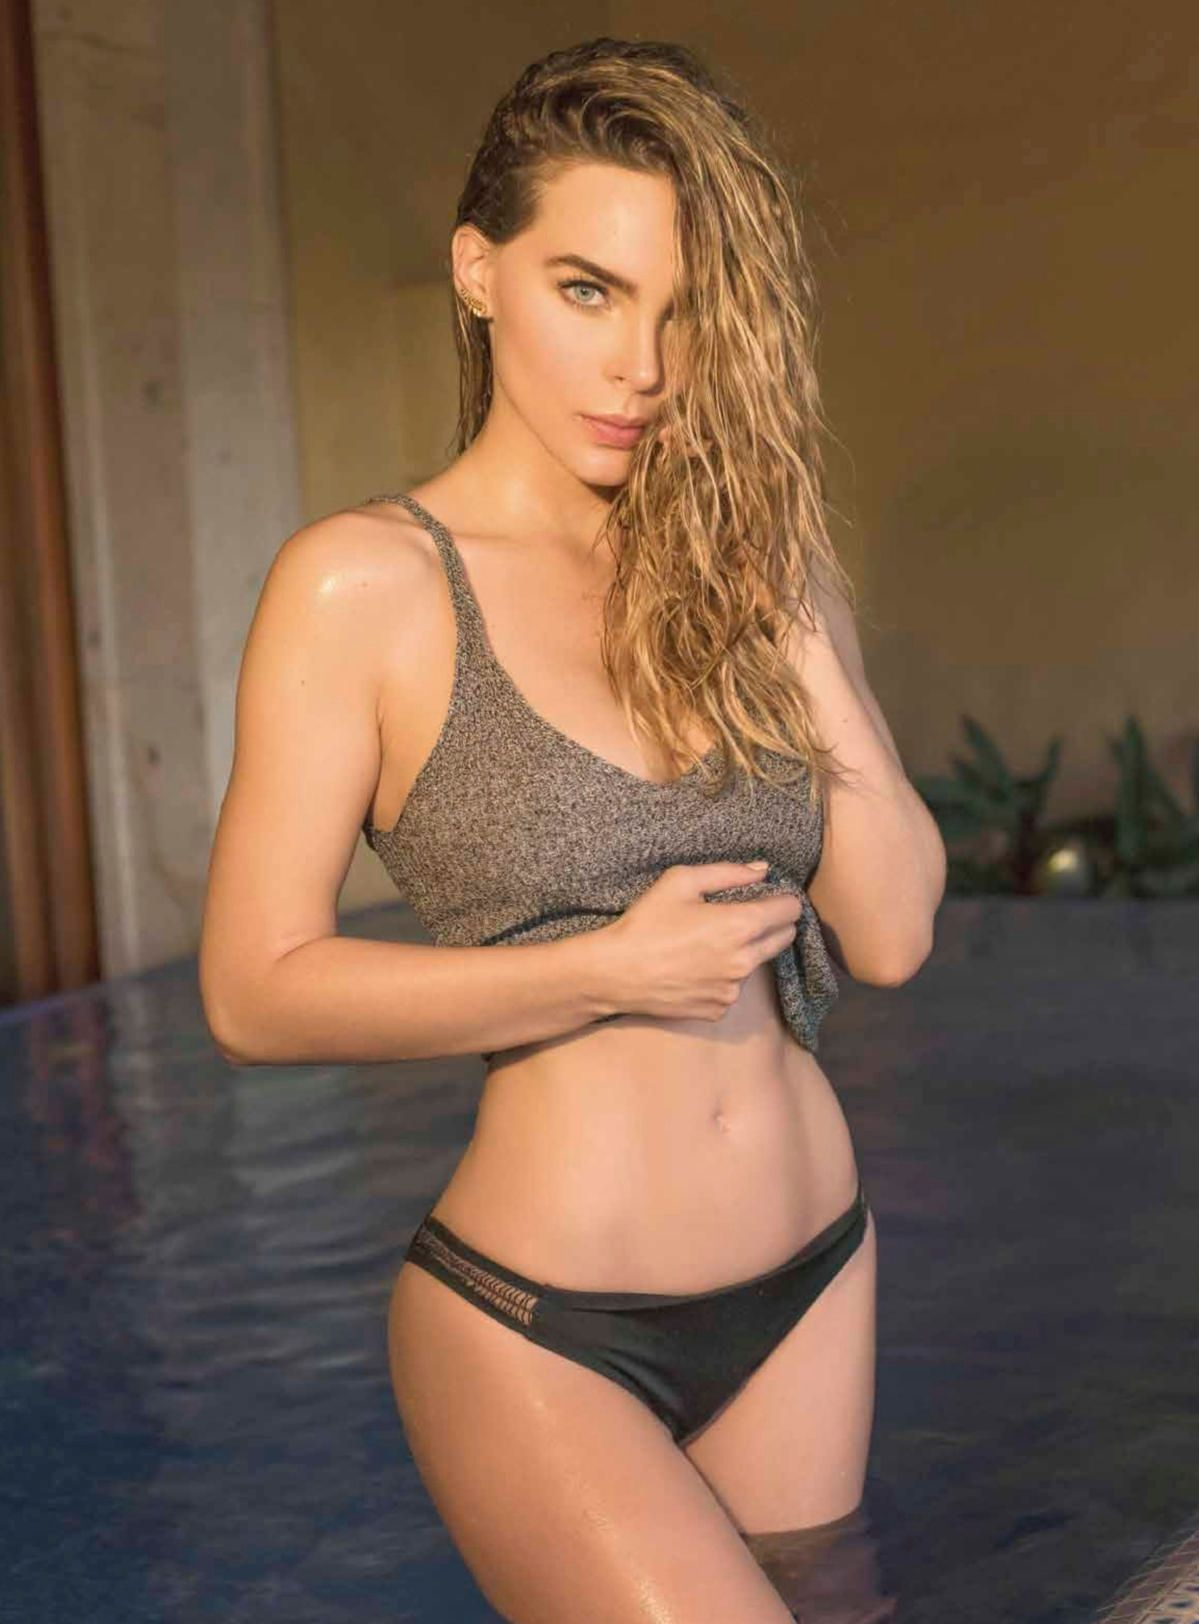 Belinda Peregrin